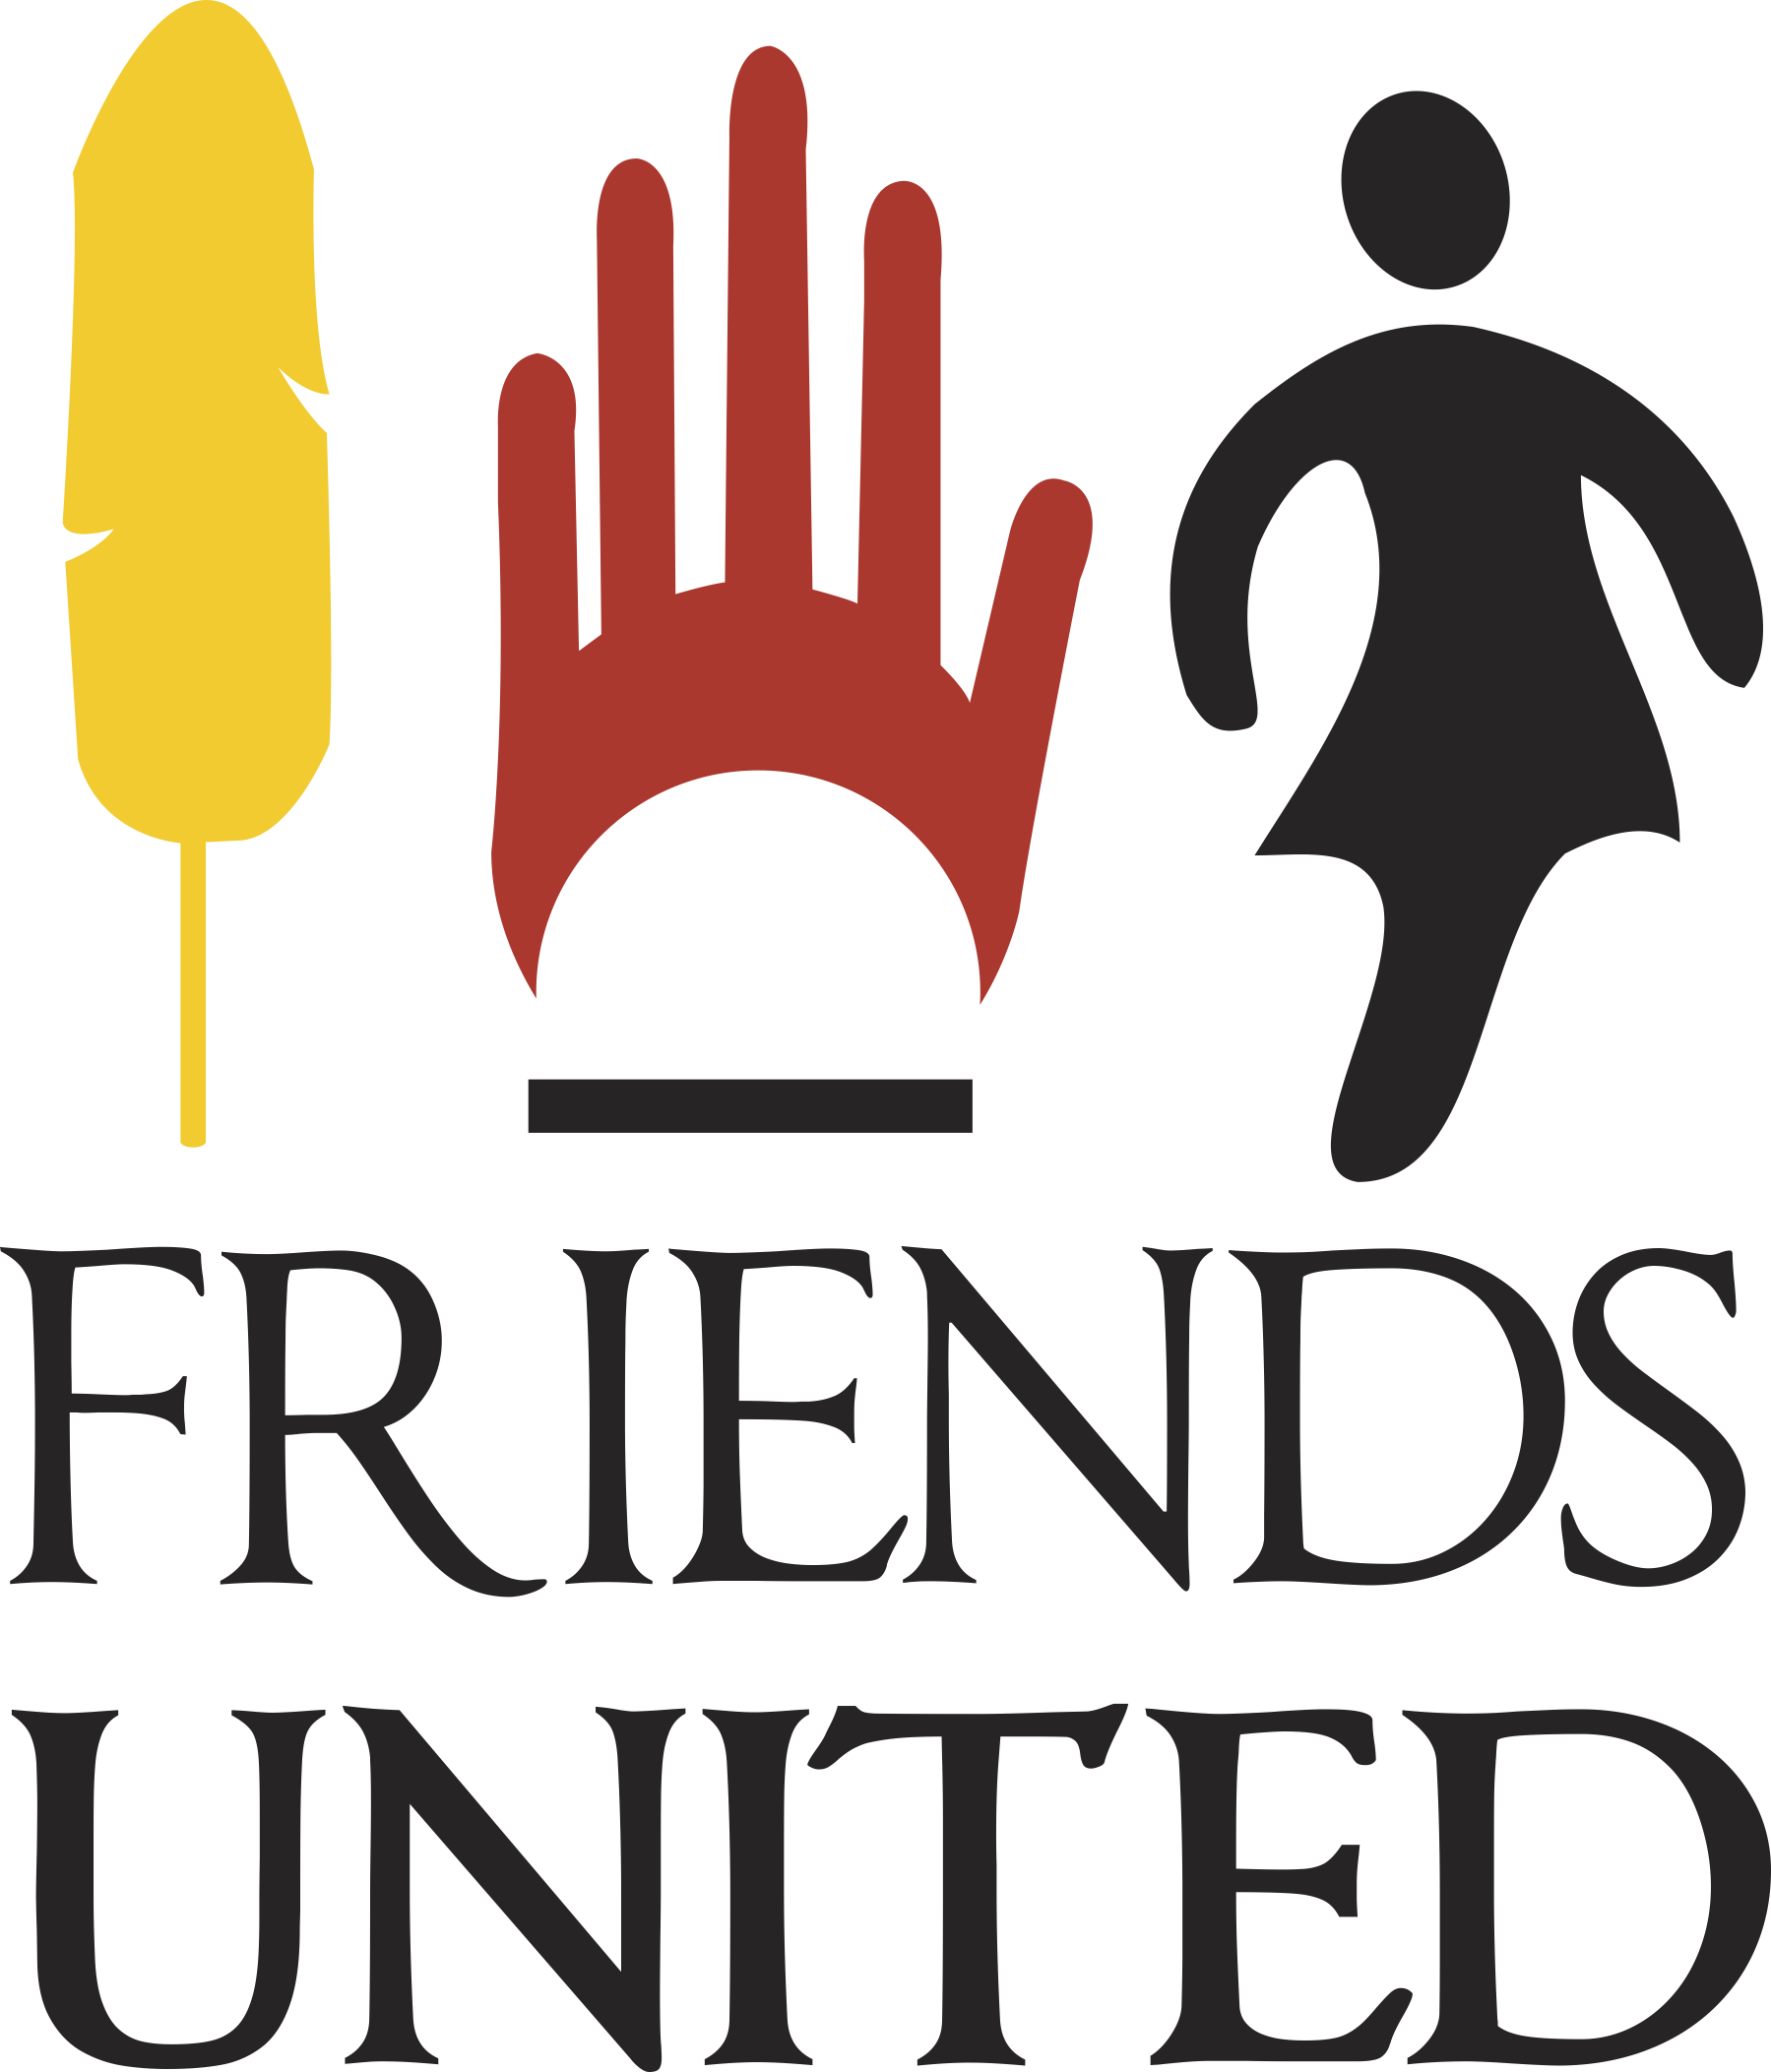 Friends United logo